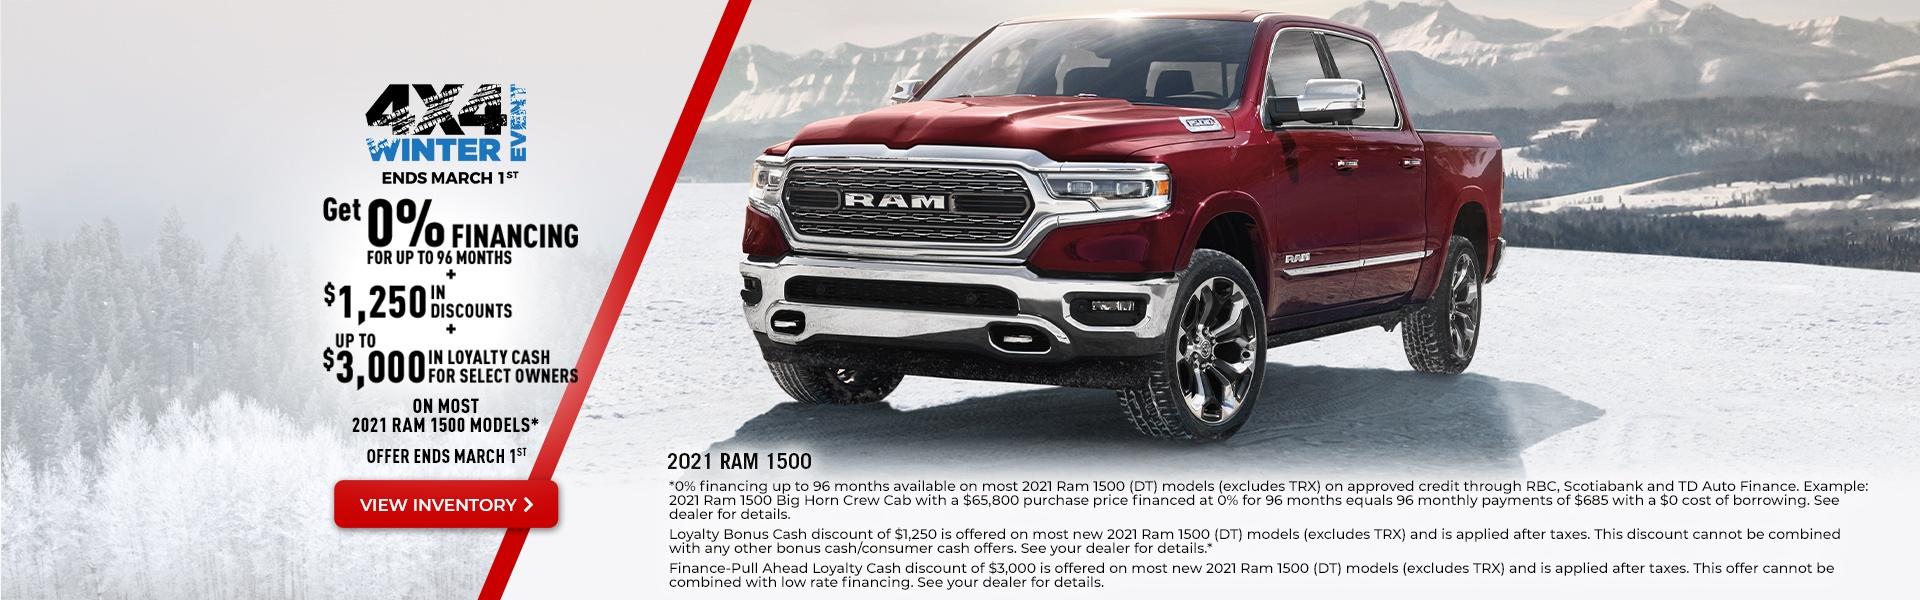 2021 RAM 1500 Promotional Banner